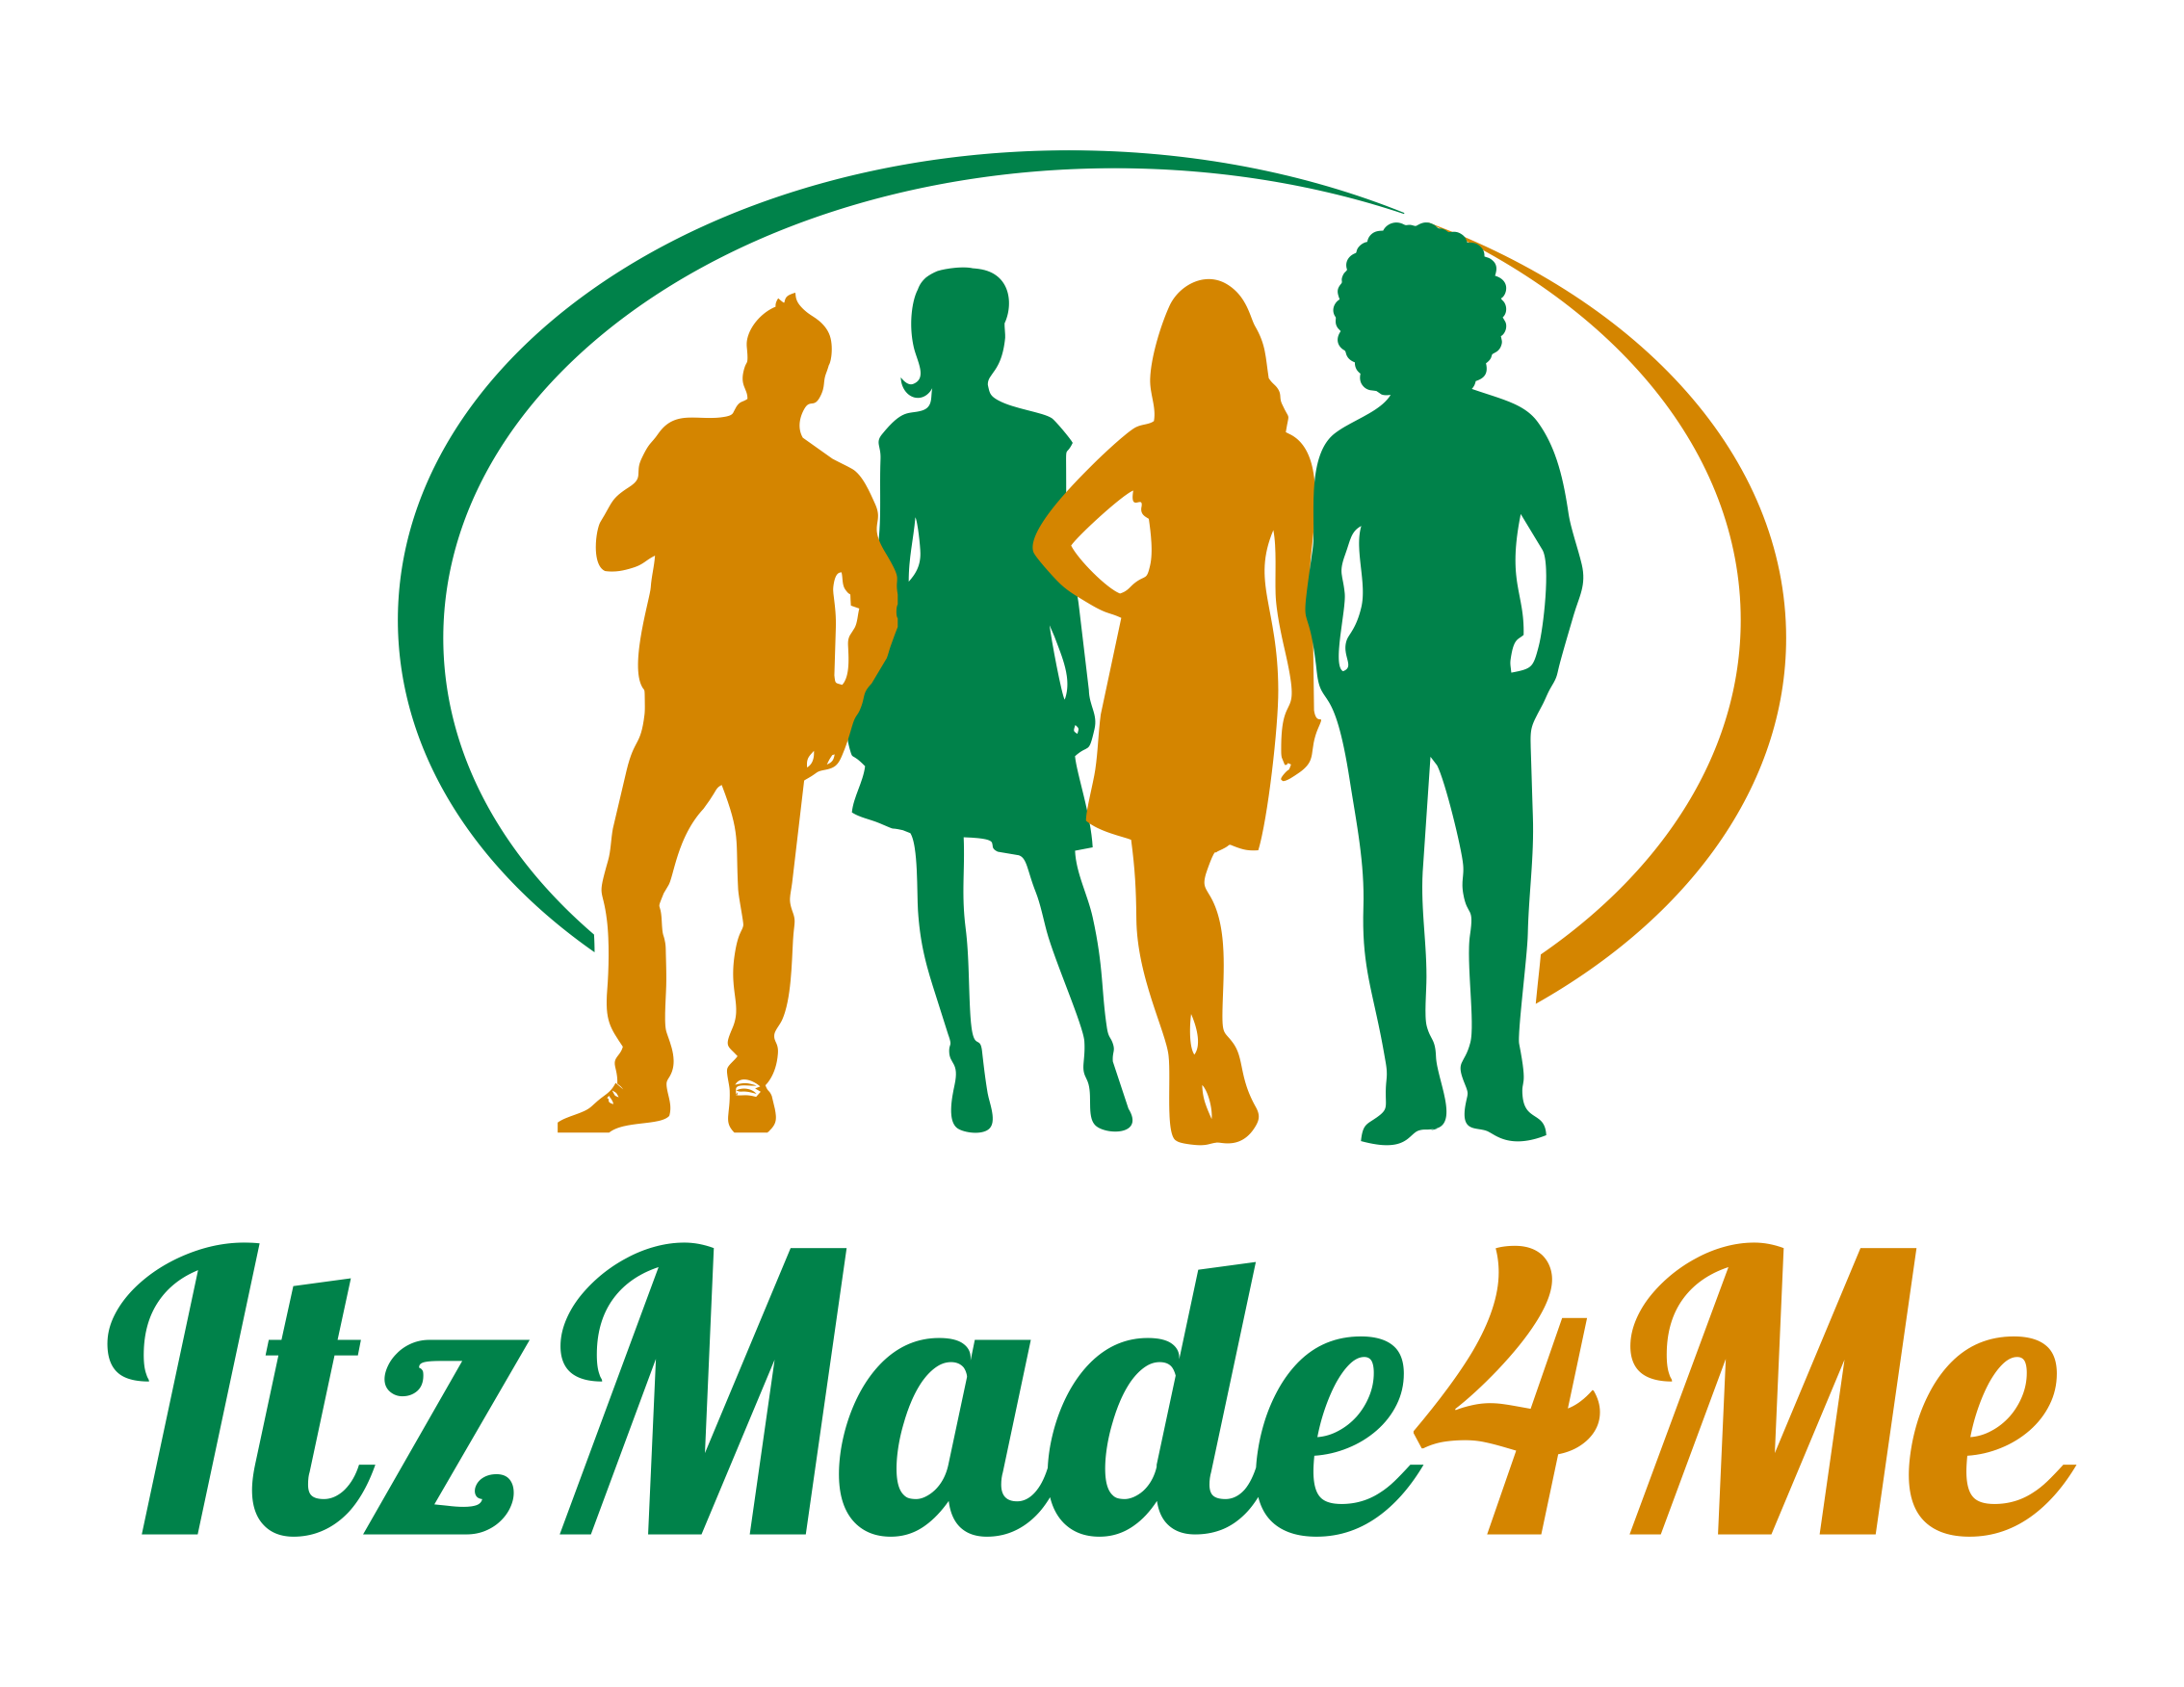 ItzMade4Me